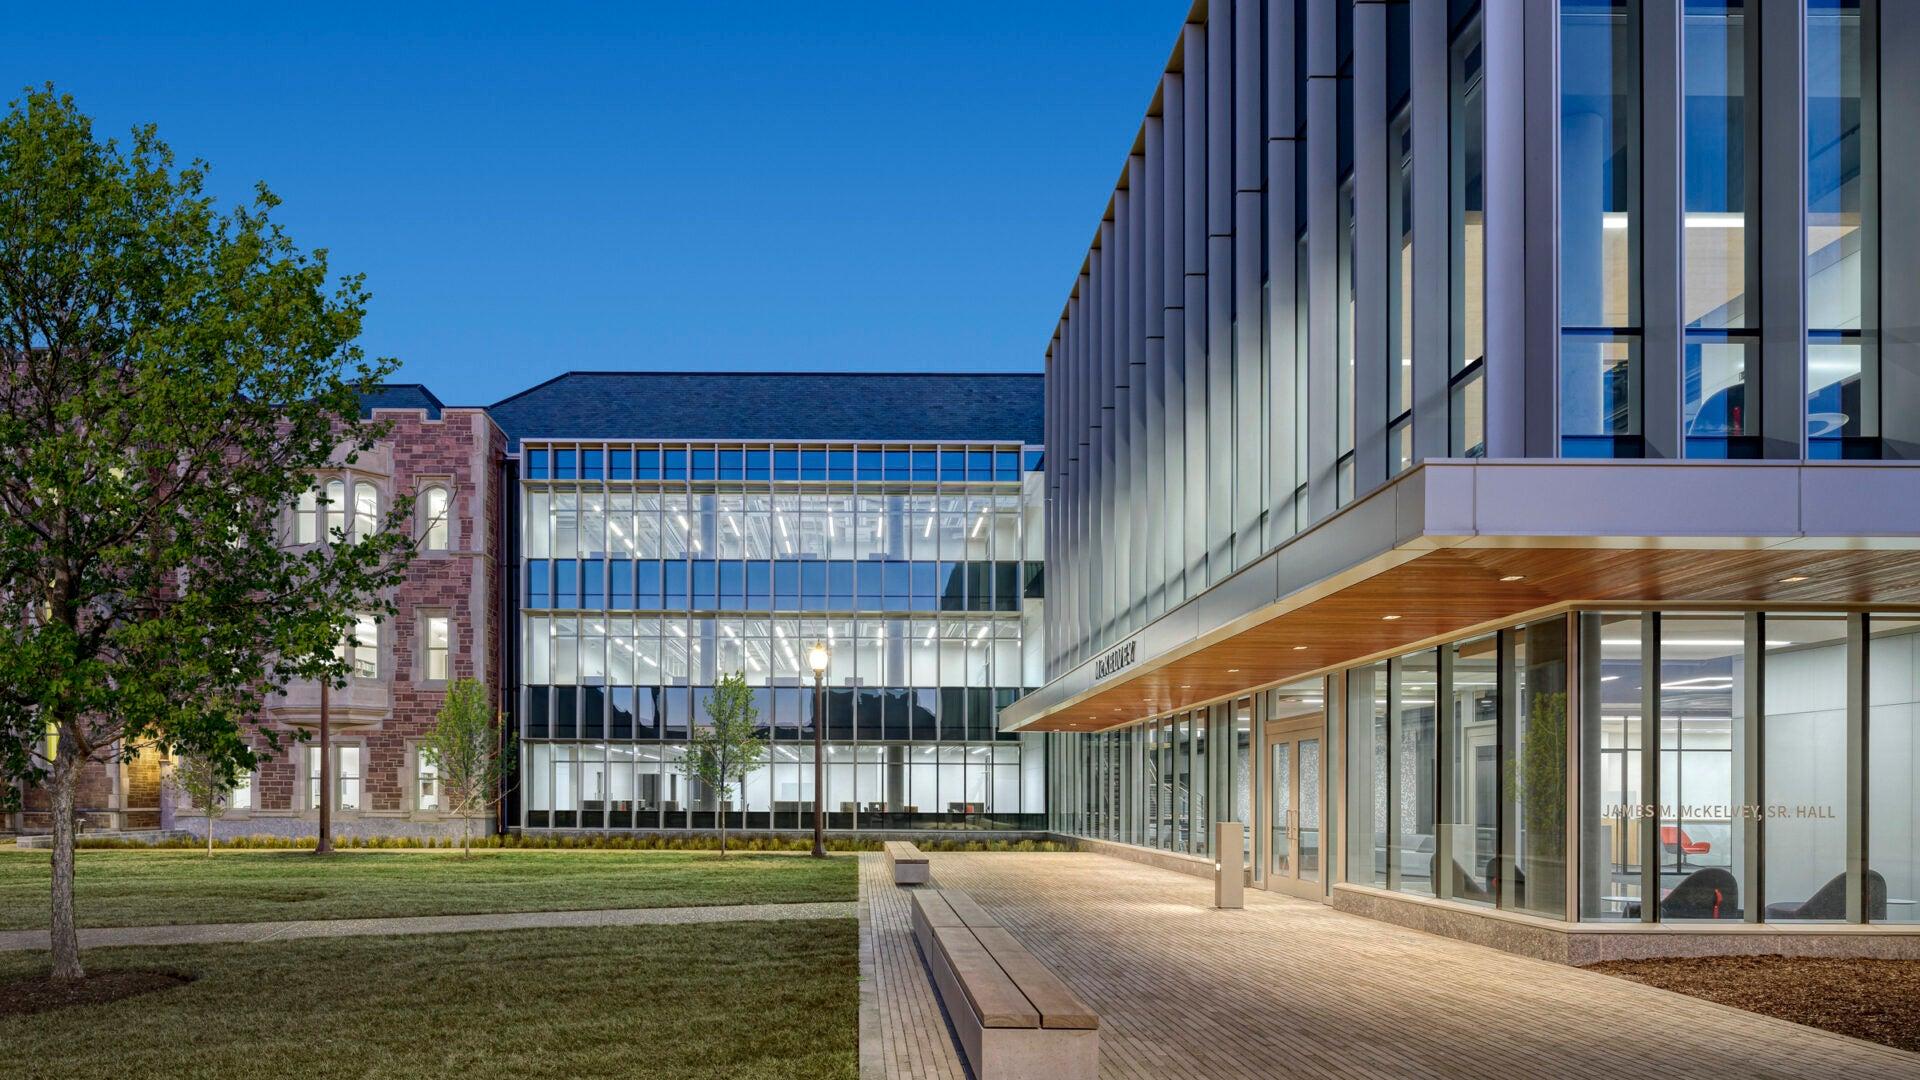 McKelvey Hall at Washington University; design by Perkins Eastman